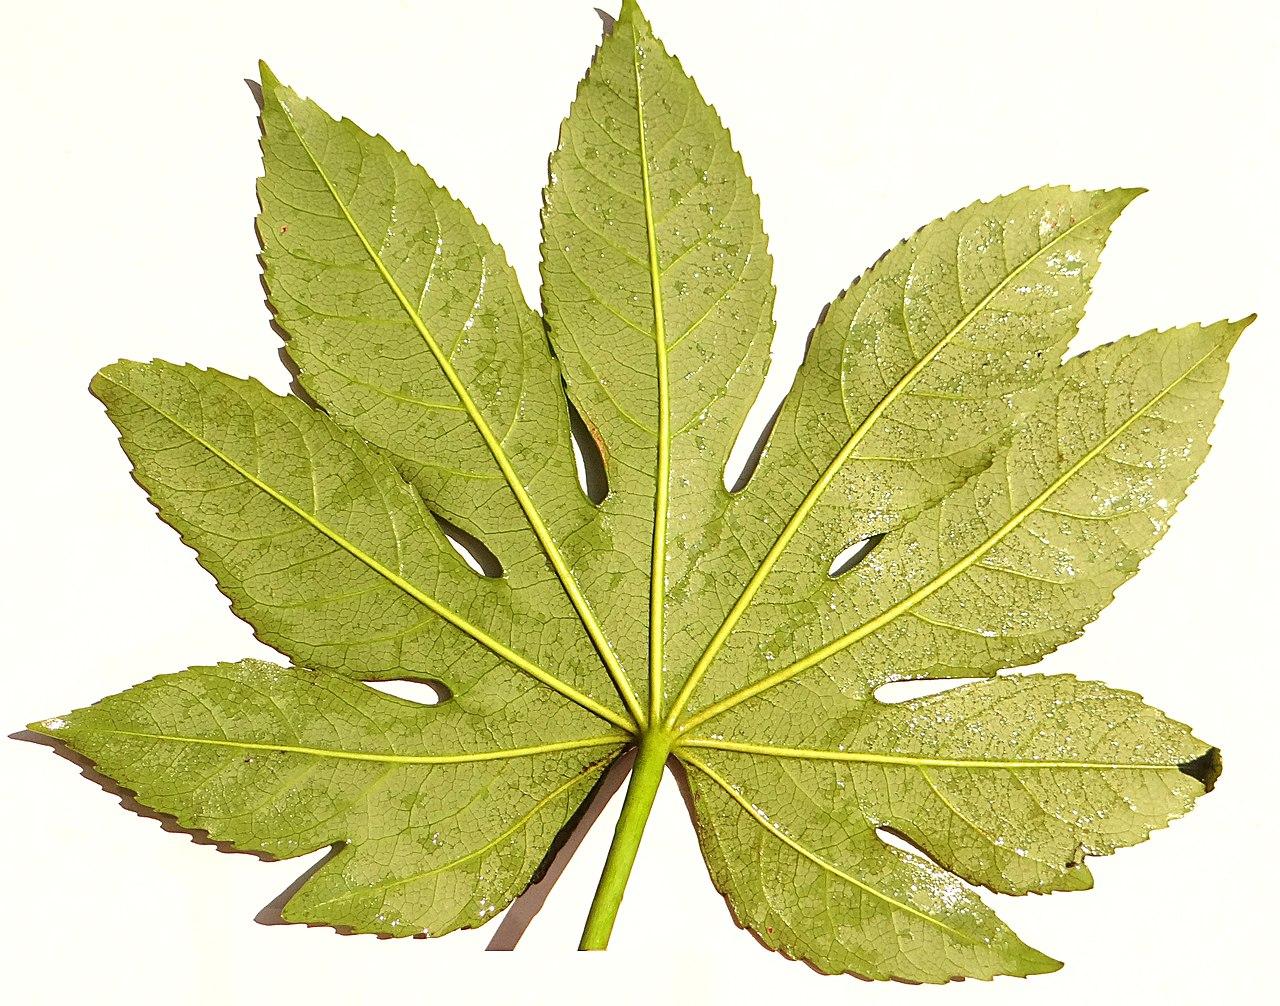 File:Fatsia japonica leaf planar back.JPG